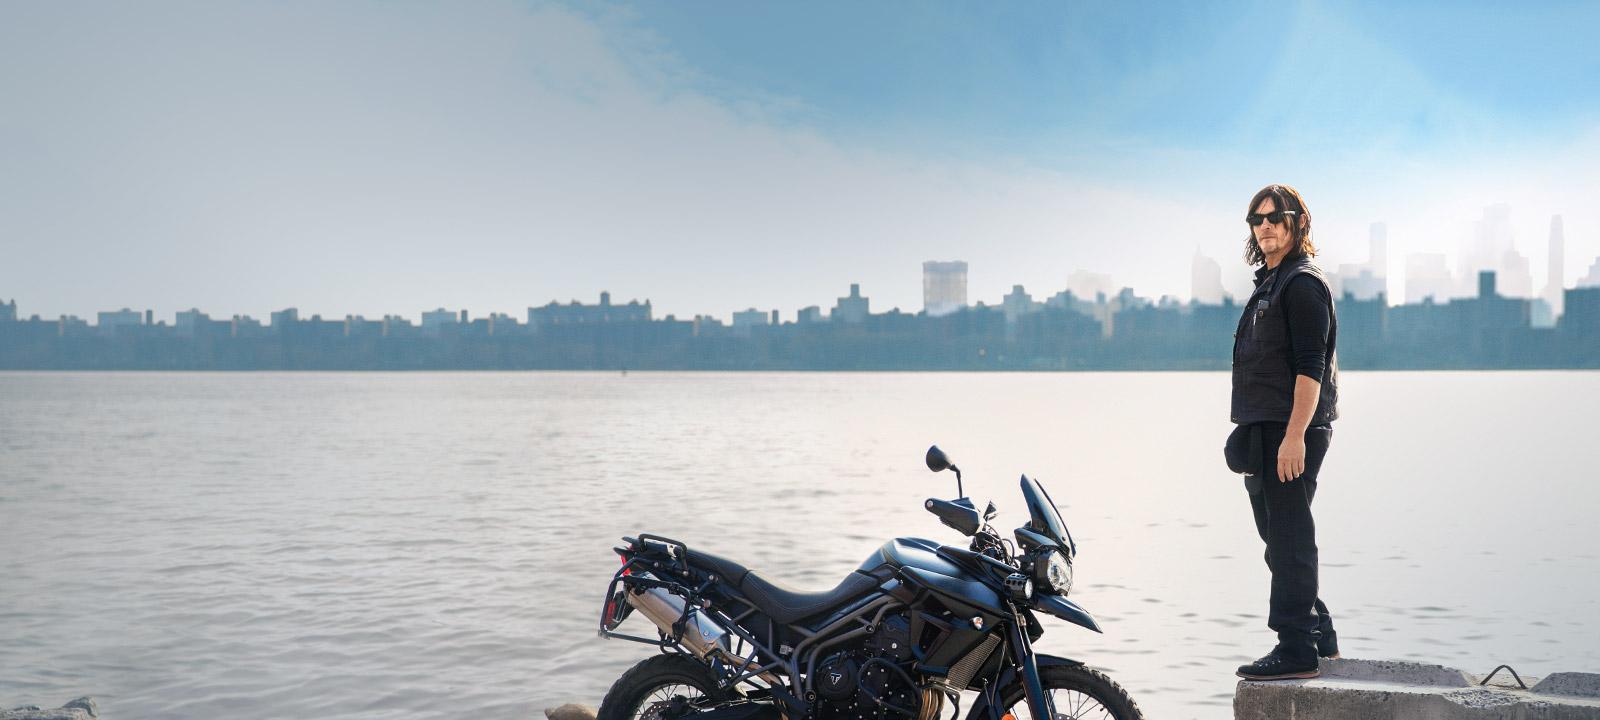 ride-with-norman-reedus-S3-temp-key-art-800x600_MobileWeb_HomeHero